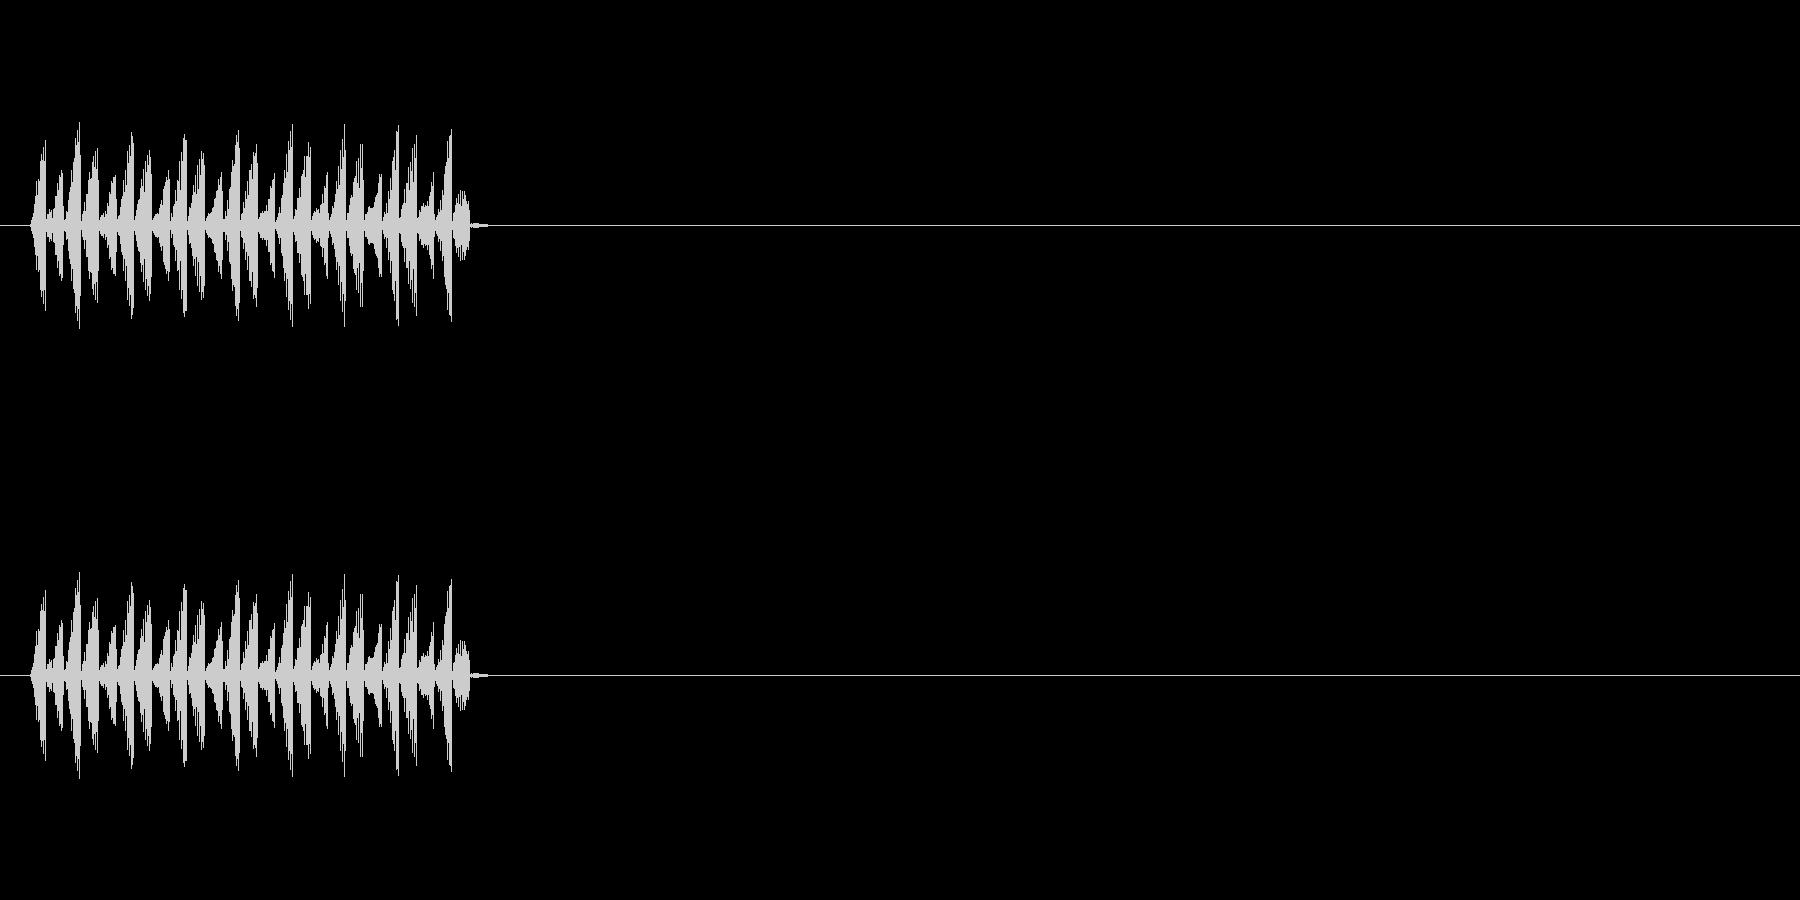 NPC会話音(声が低い)の未再生の波形